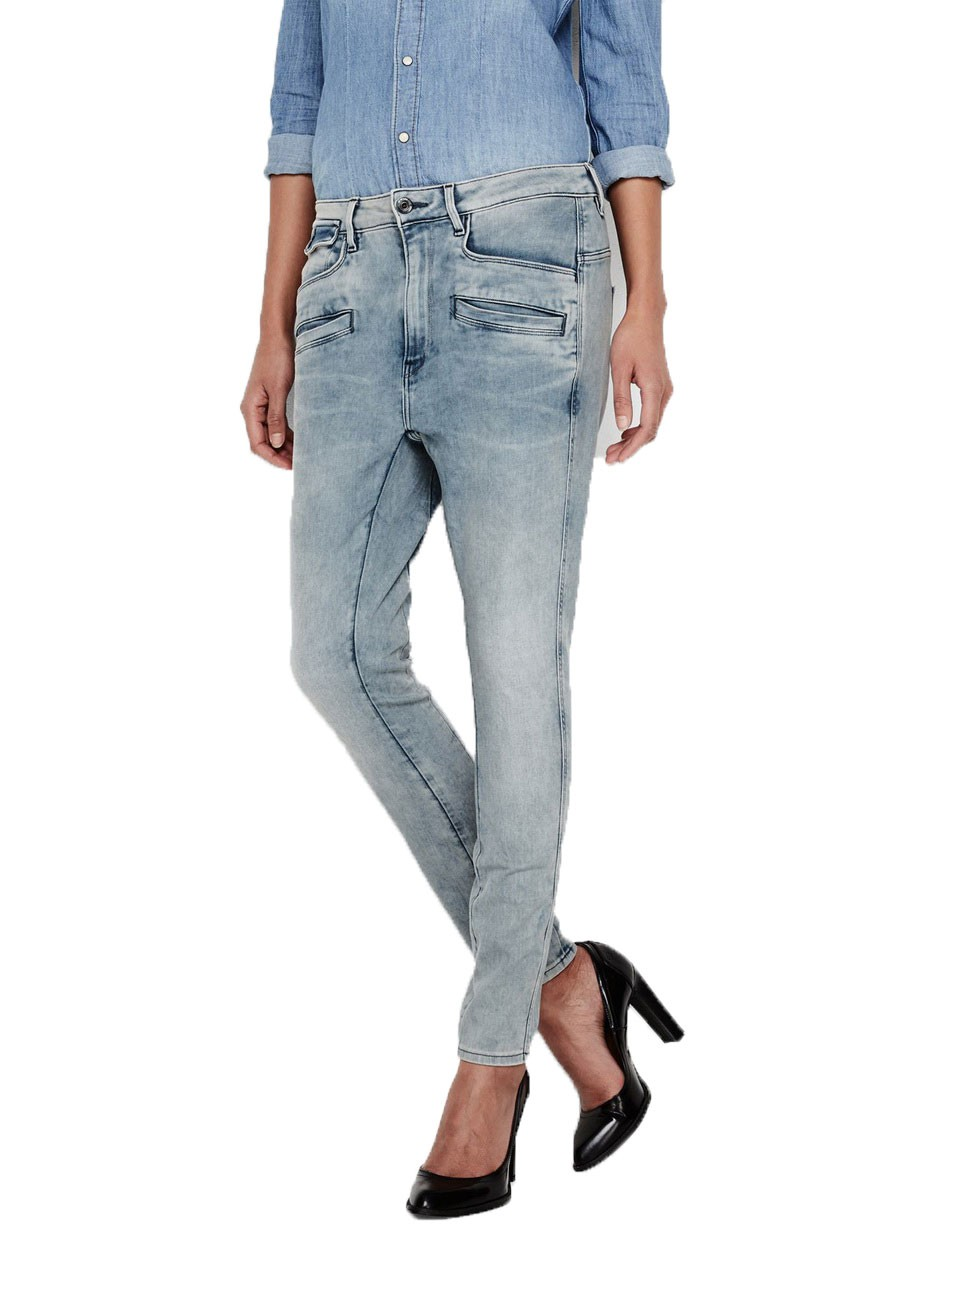 kleidung accessoires damenmode jeans. Black Bedroom Furniture Sets. Home Design Ideas